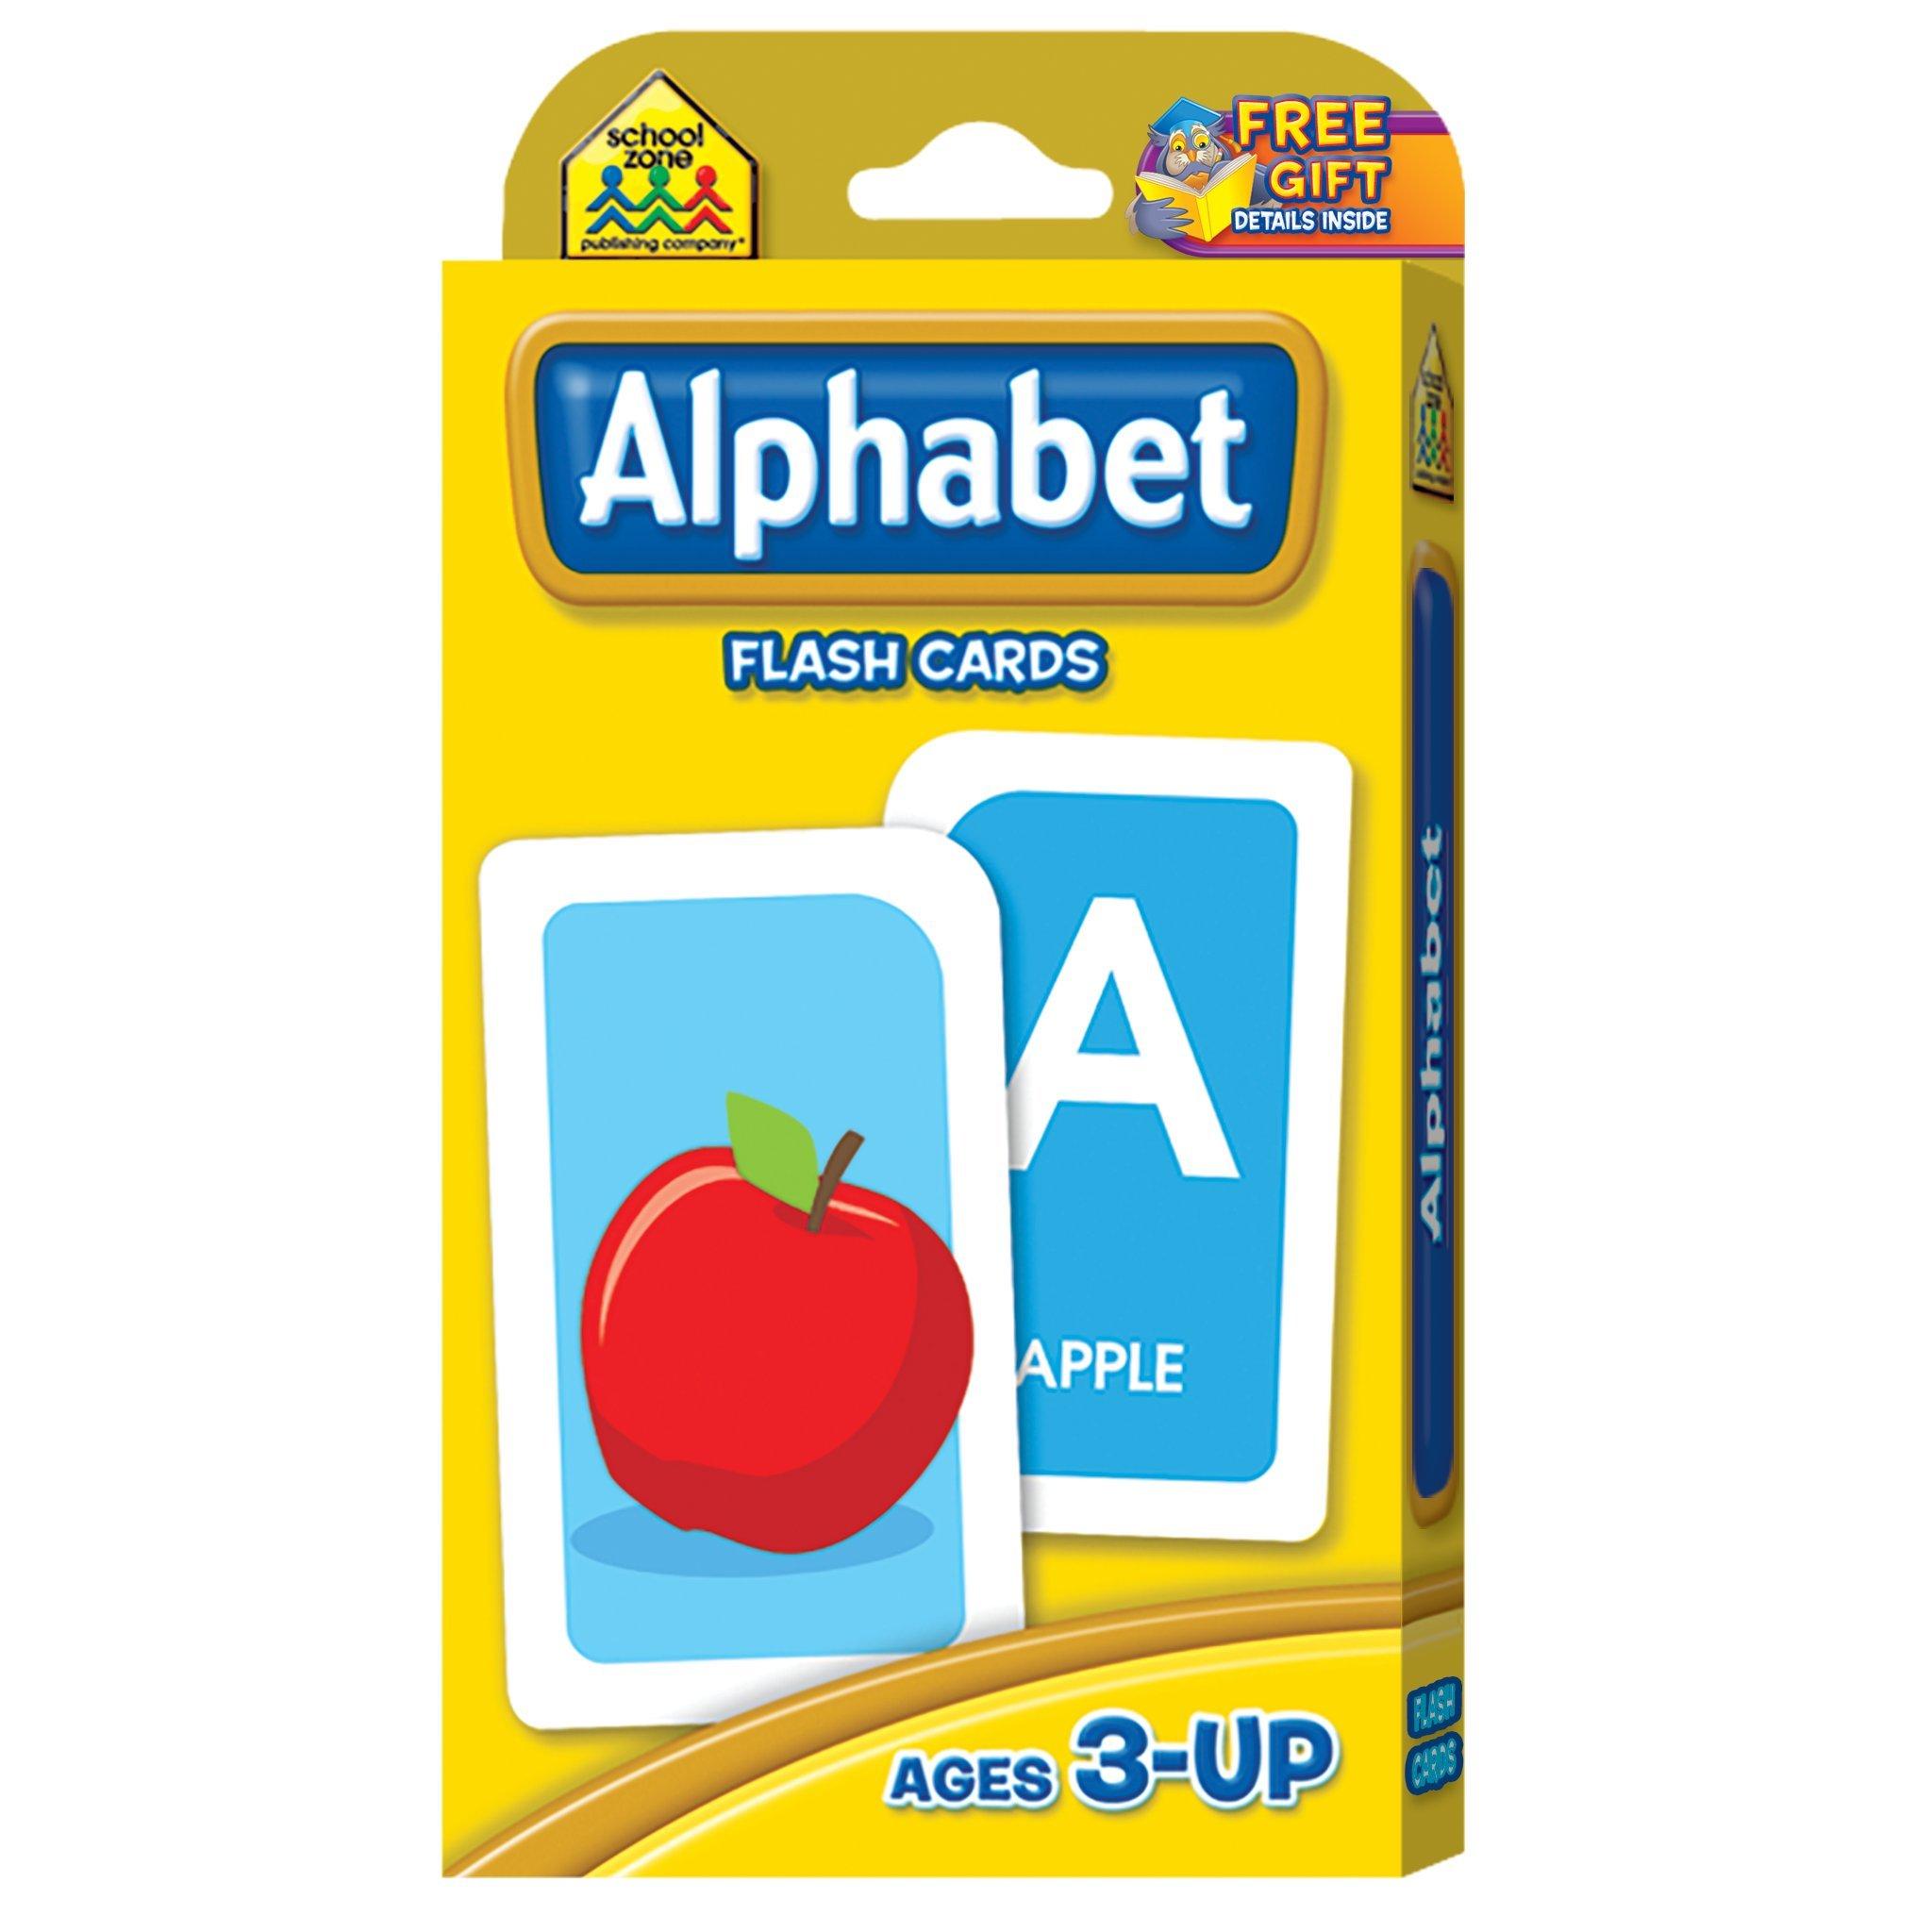 Alphabet Flash Cards product image